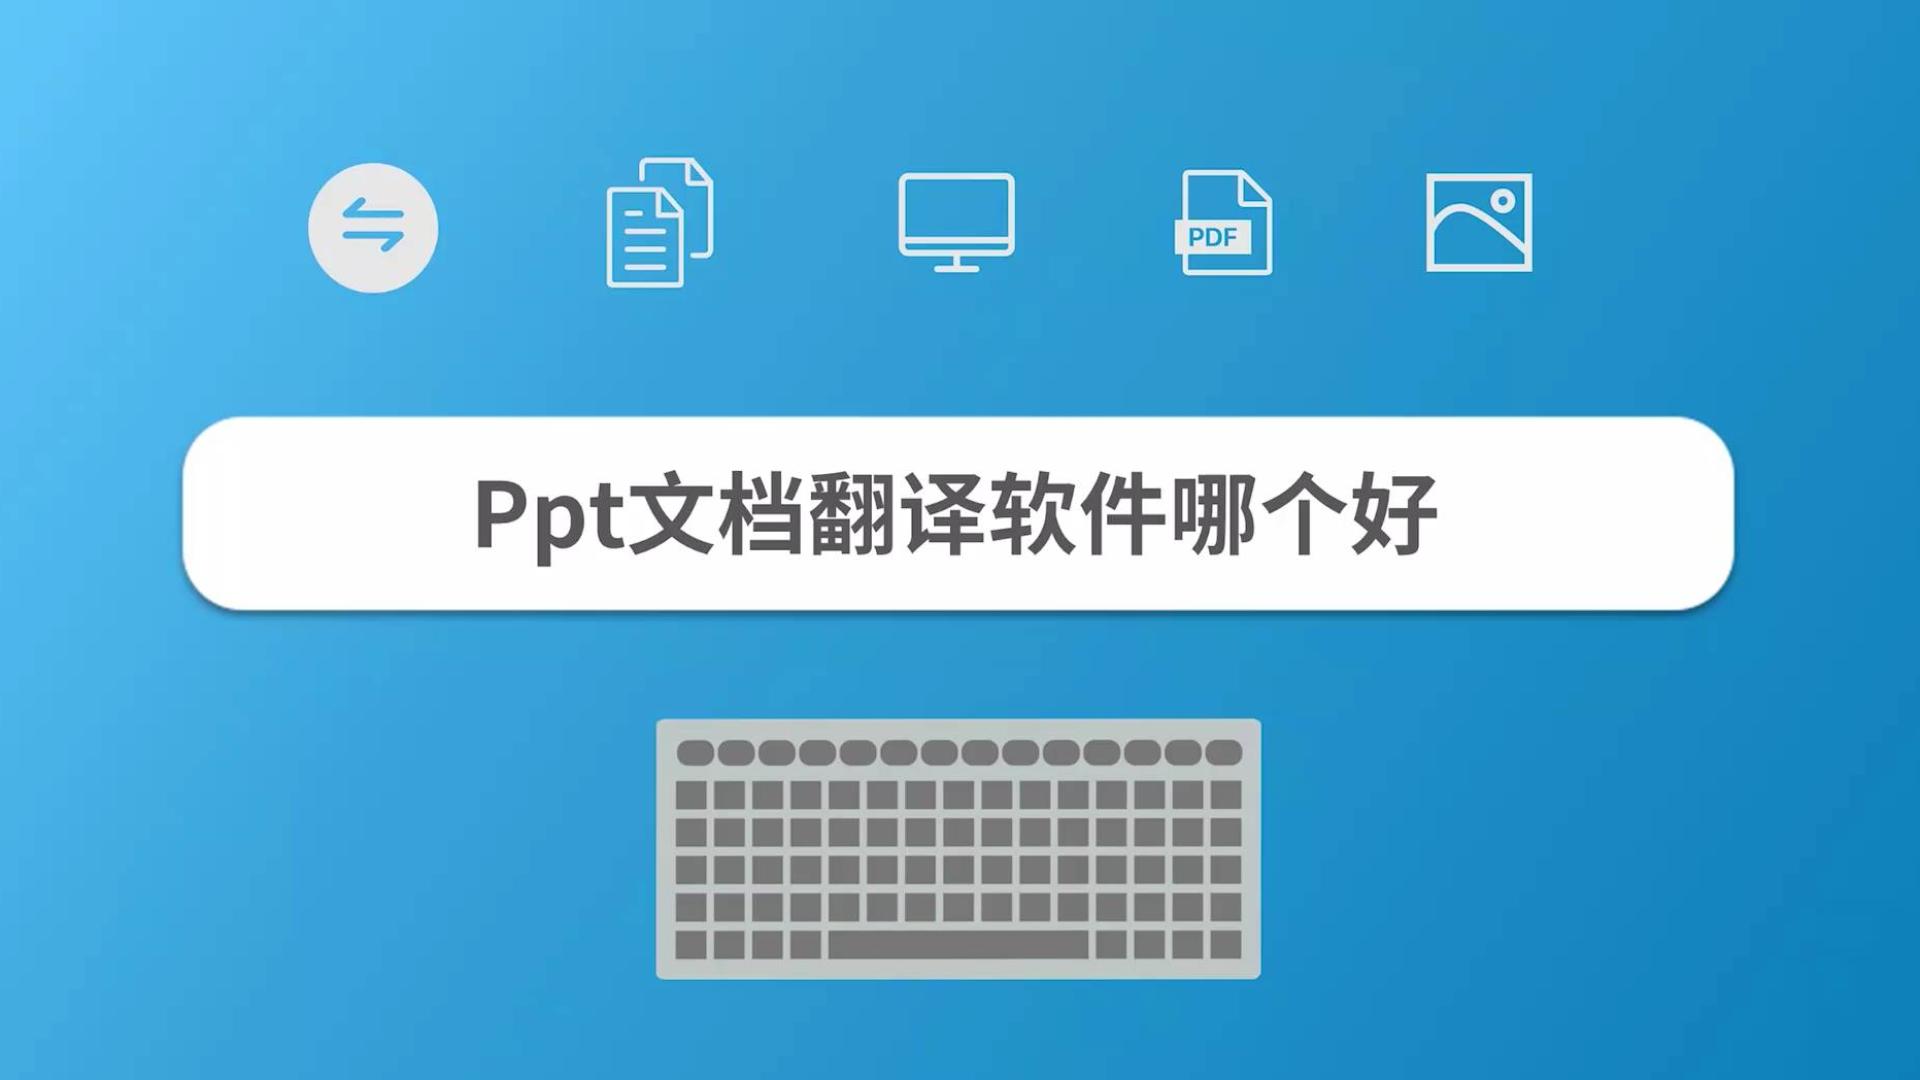 Ppt文档翻译软件哪个好